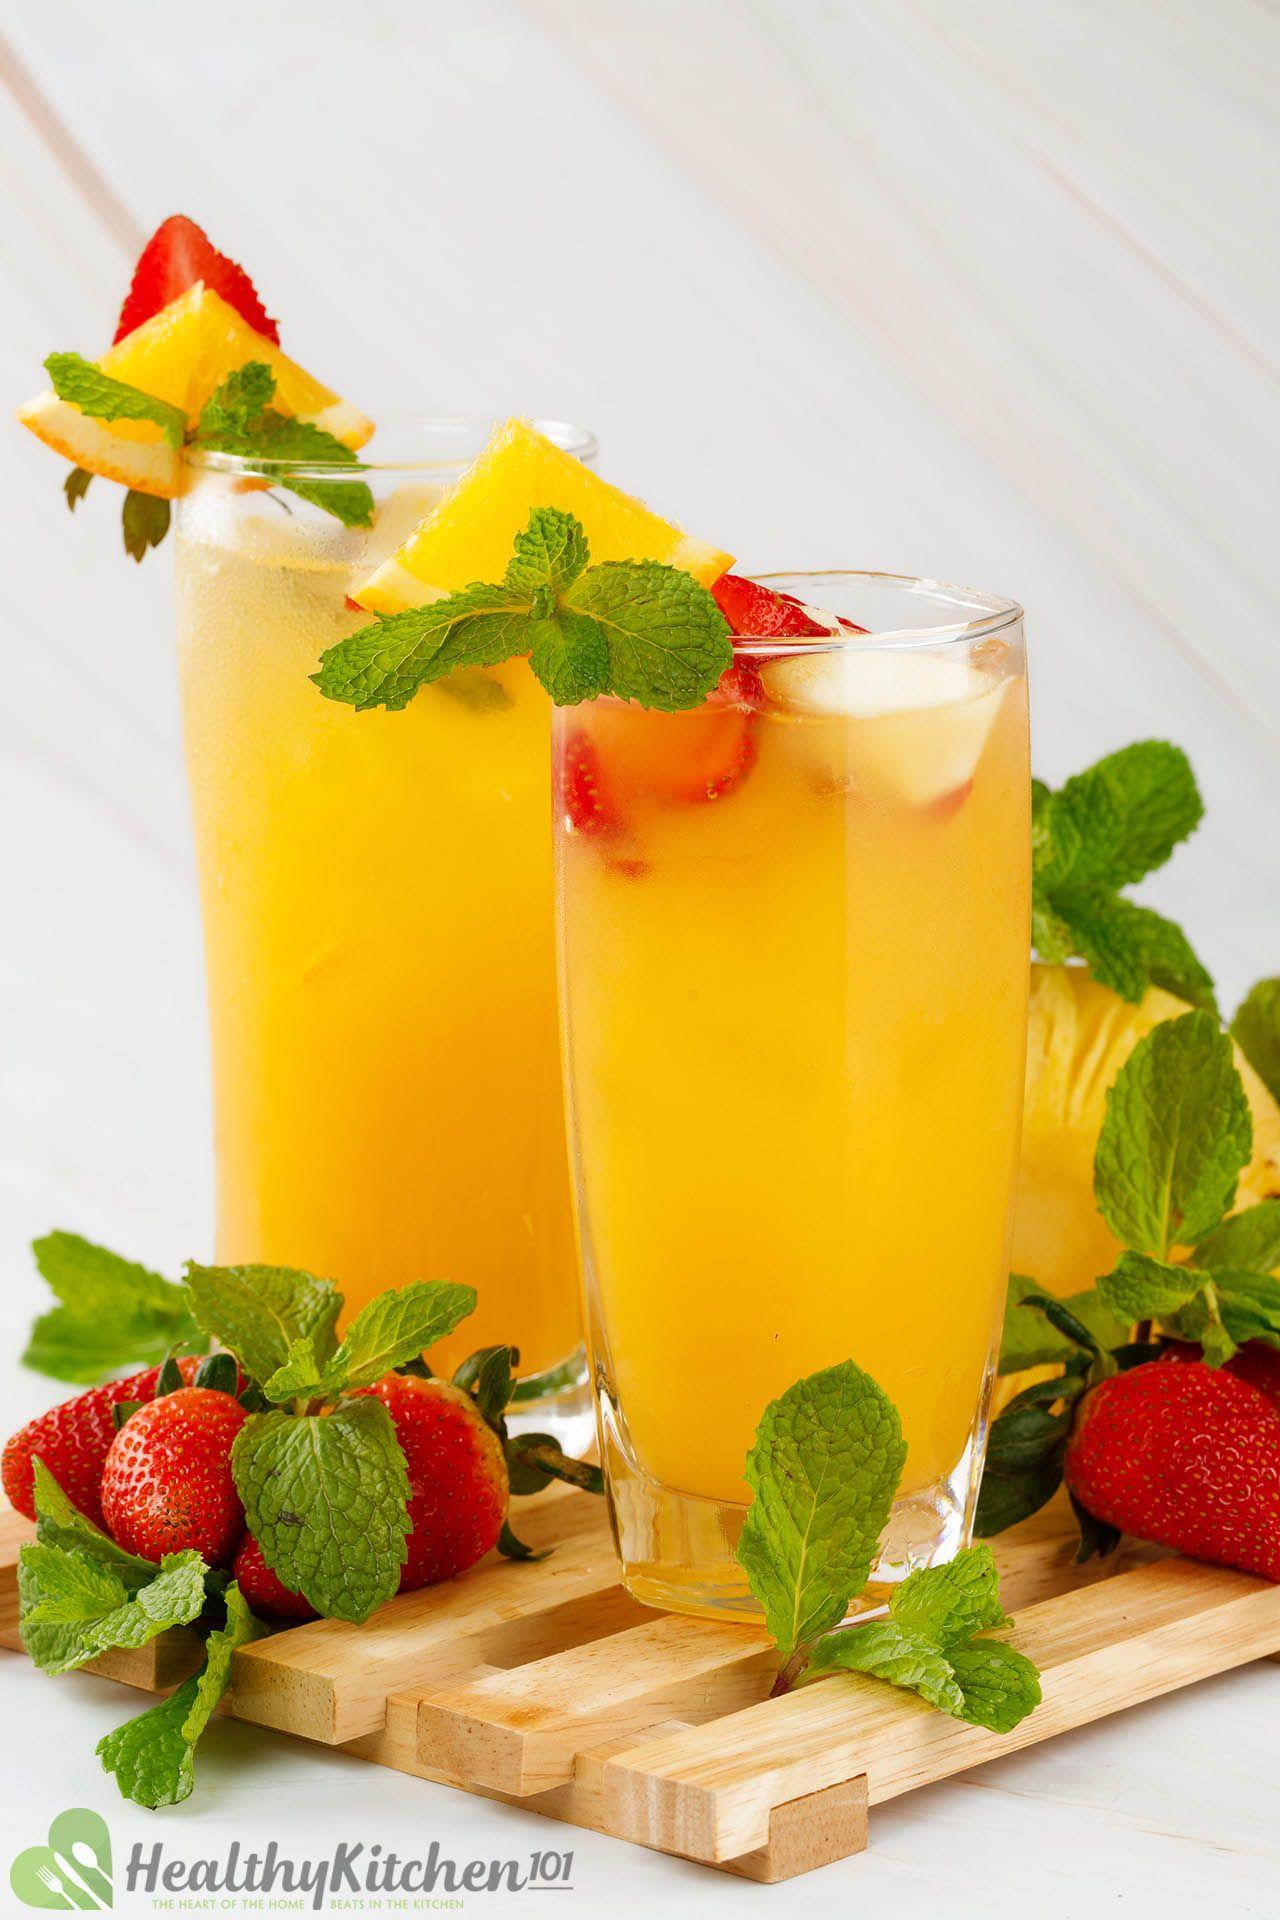 can halloween jungle juice get you drunk